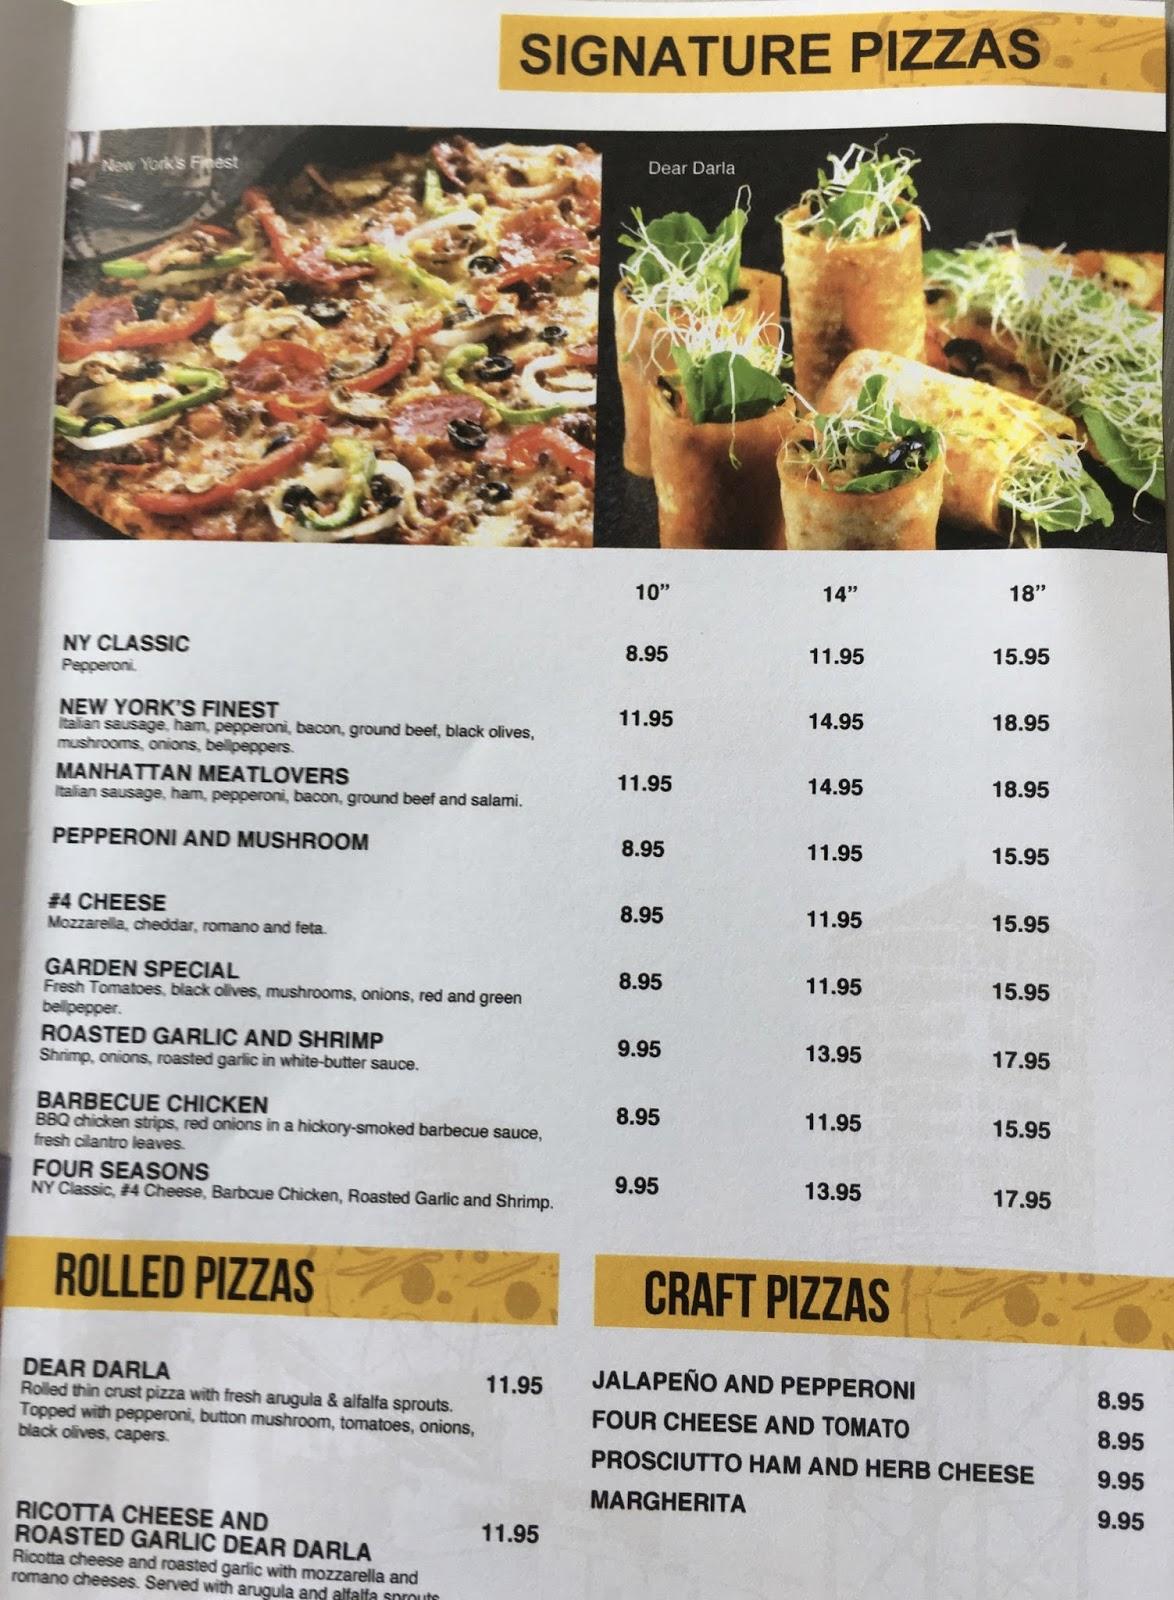 TASTE OF HAWAII: YELLOW CAB PIZZA COMPANY